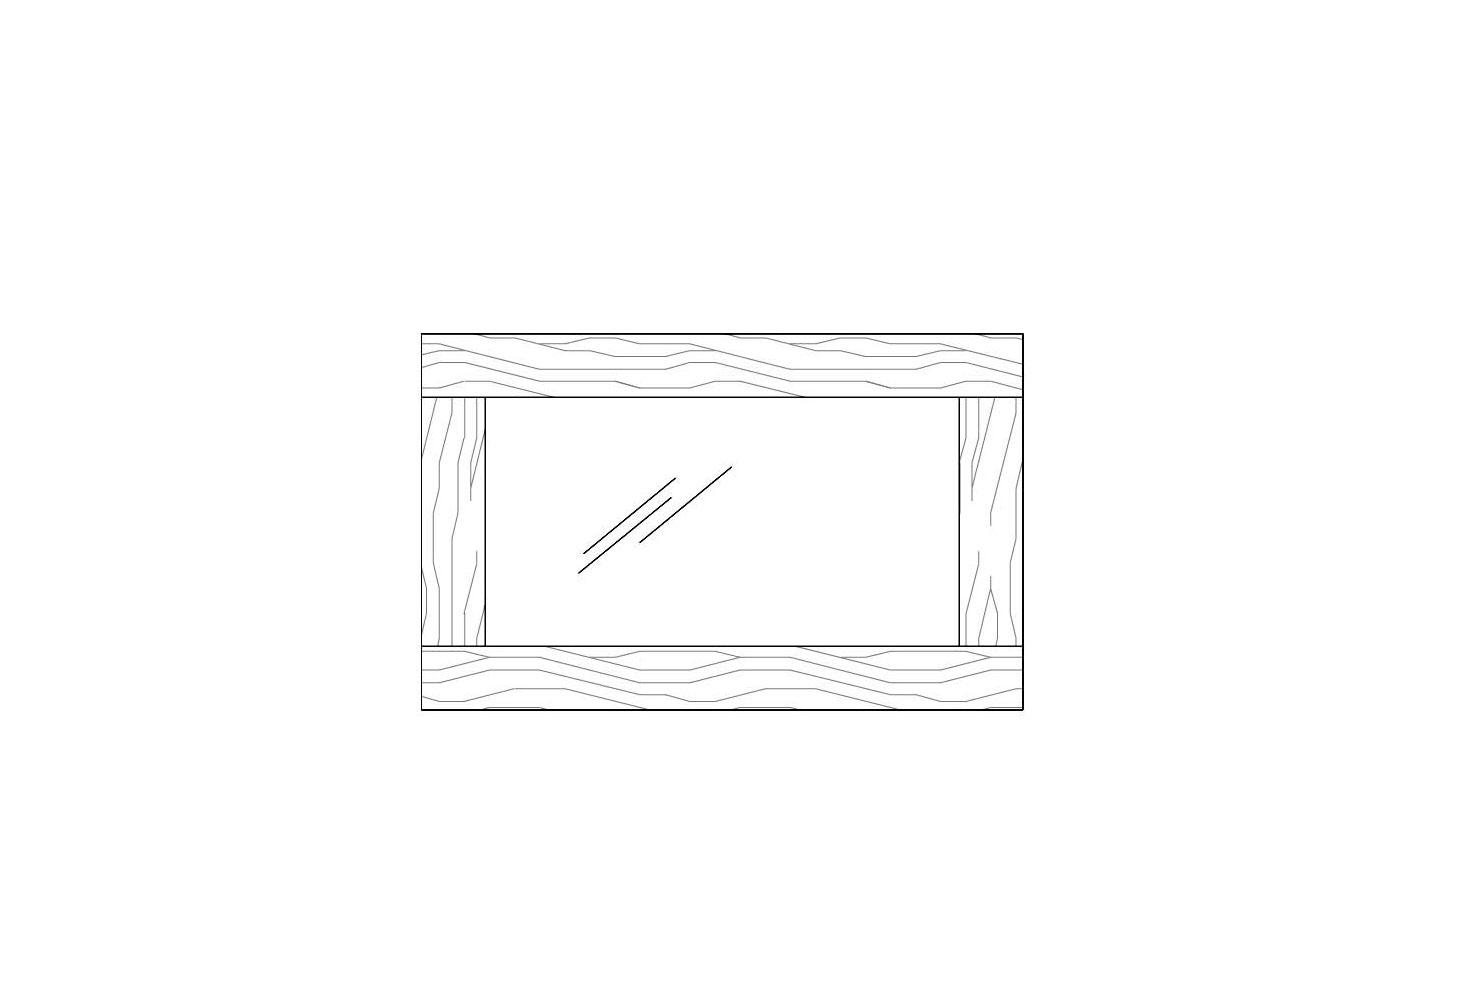 specchio-120-bixio-disegno